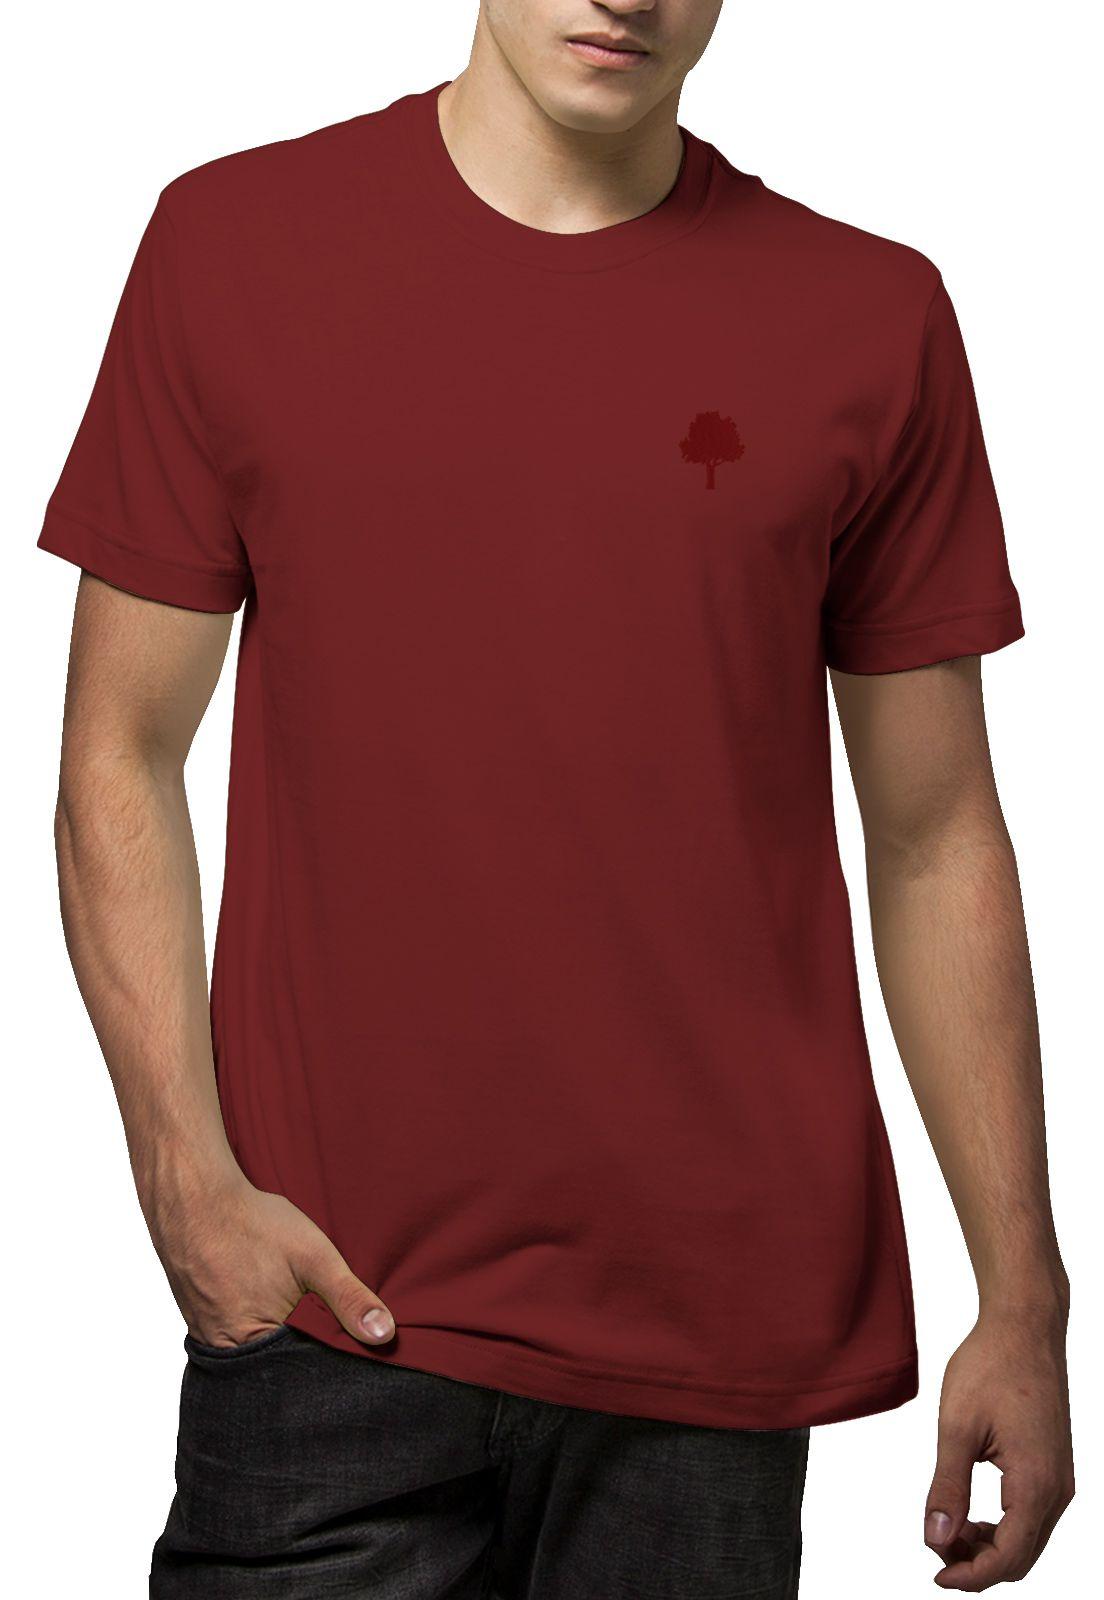 Camiseta Amazônia Básica Árvore Bordada - Vinho